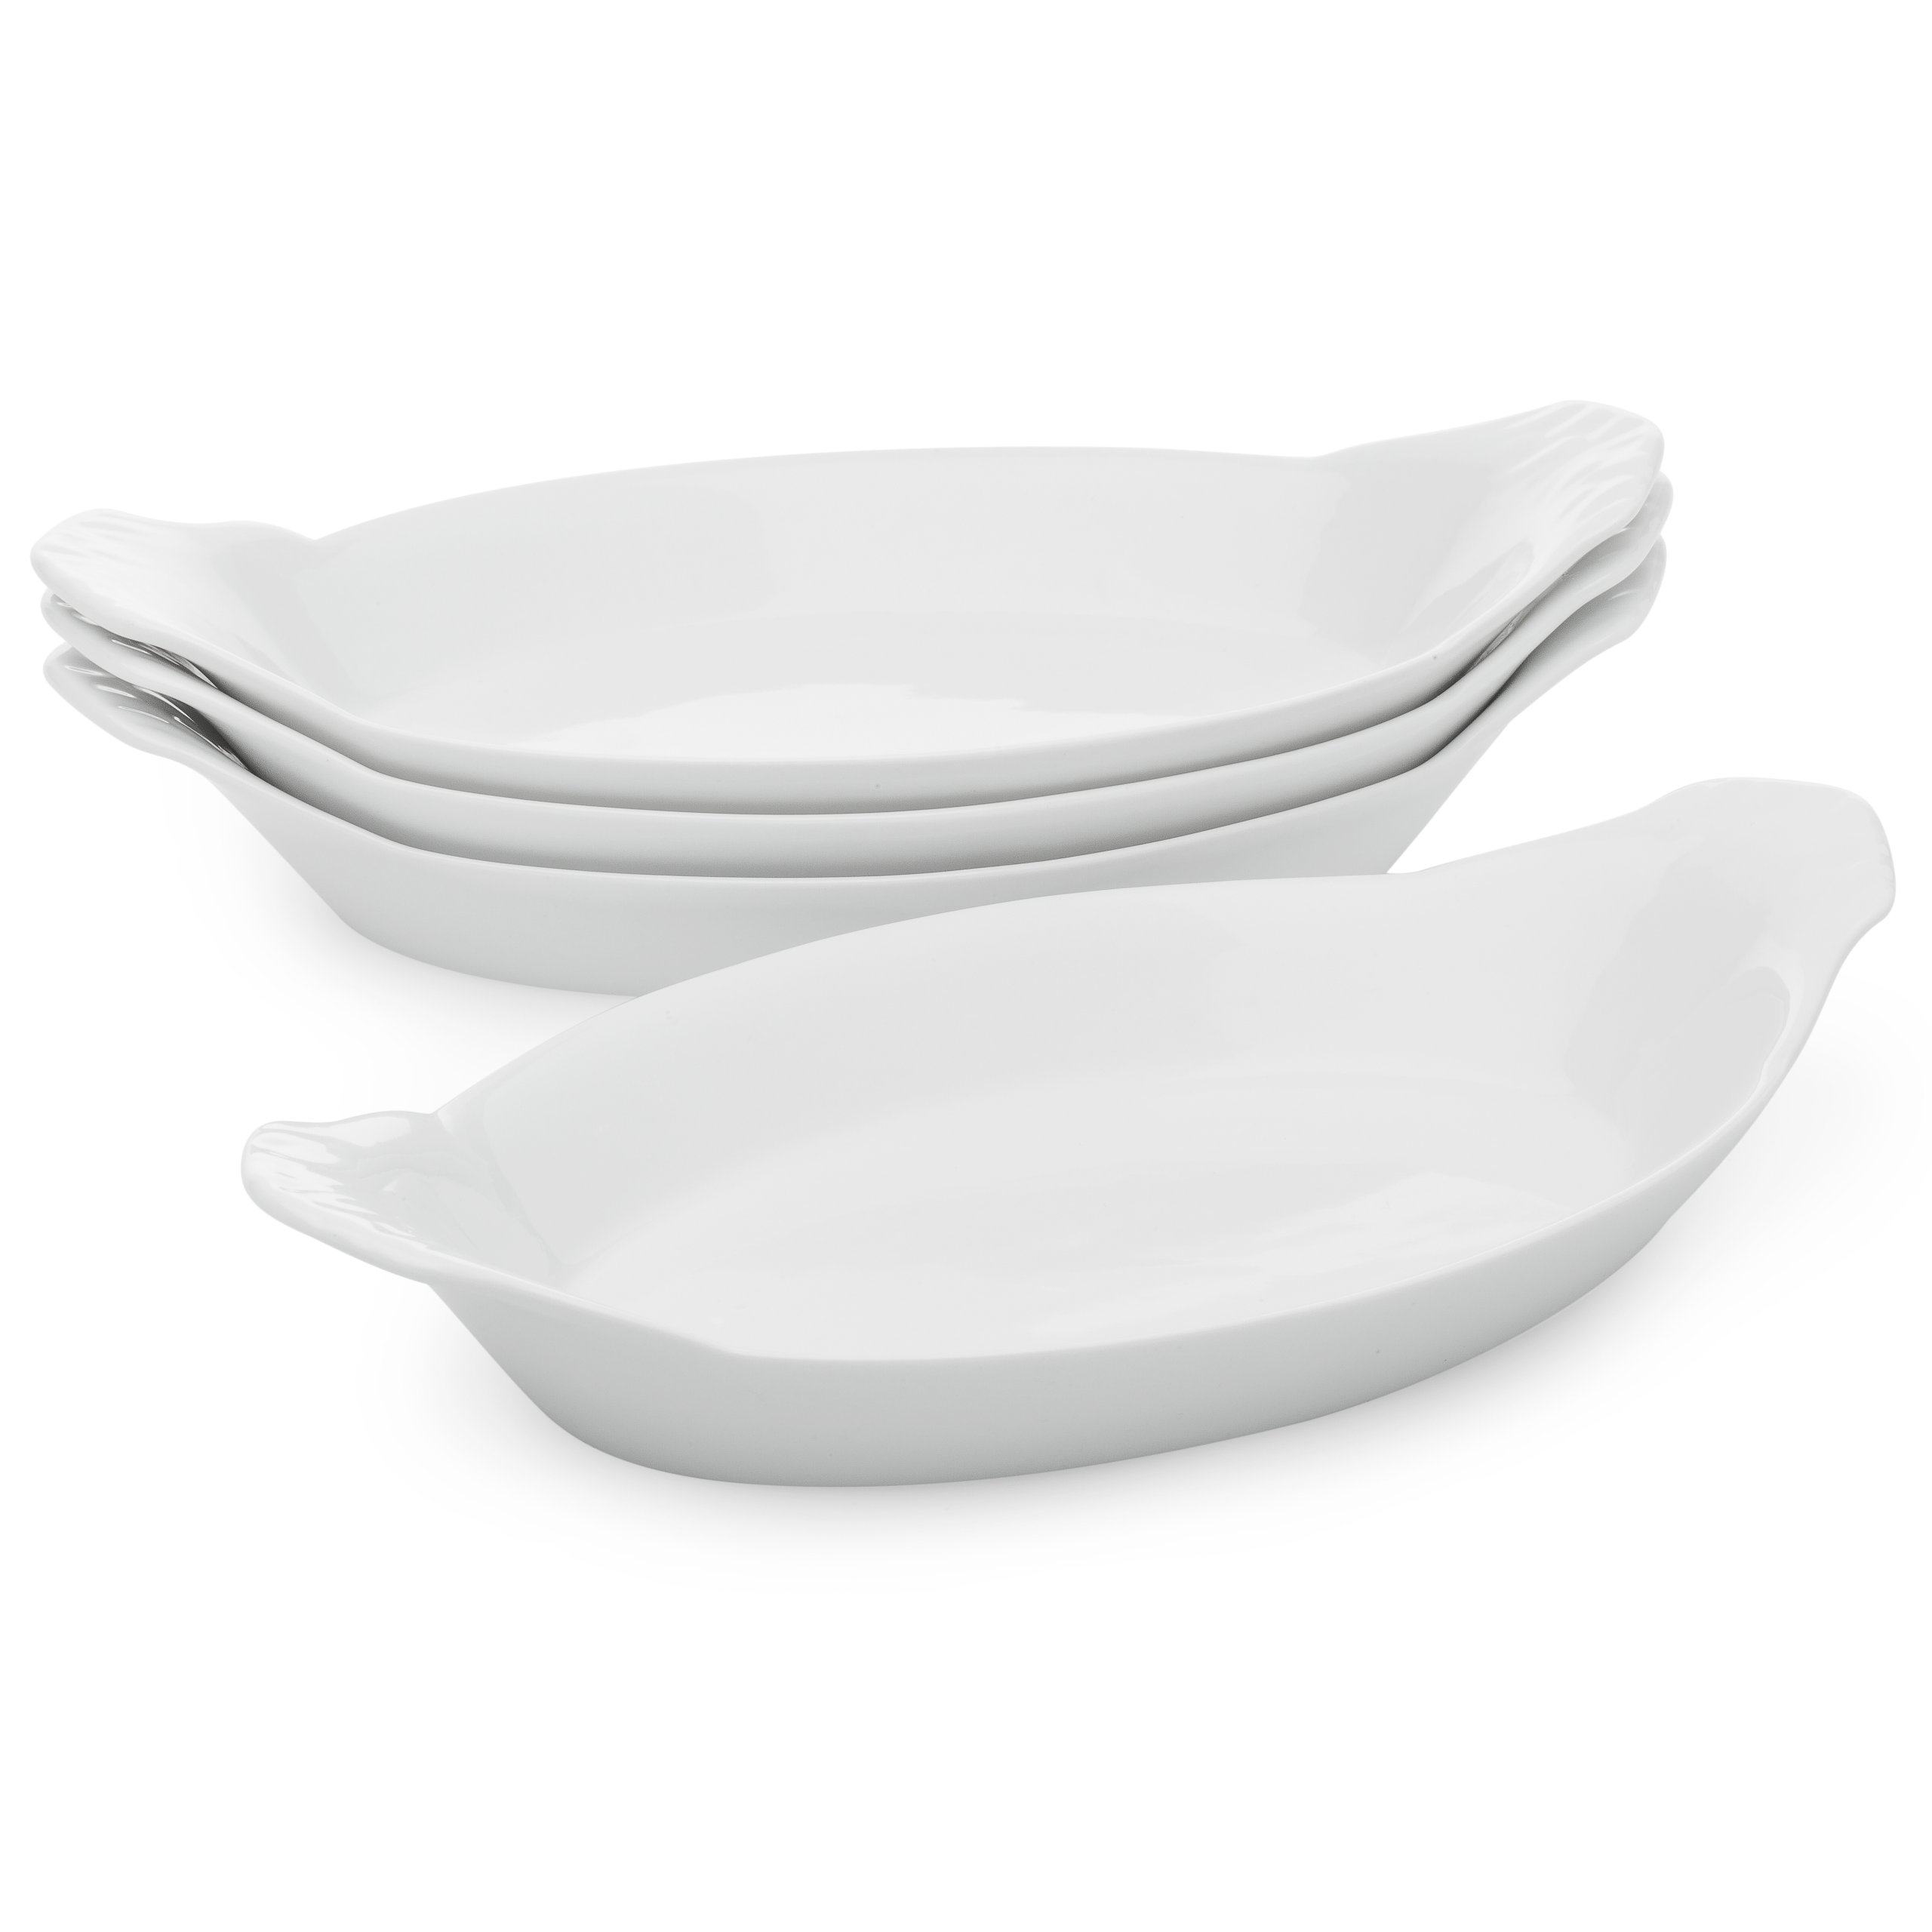 HIC Oval Au Gratin Baking Dishes, Fine White Porcelain, 10'', Set of 4